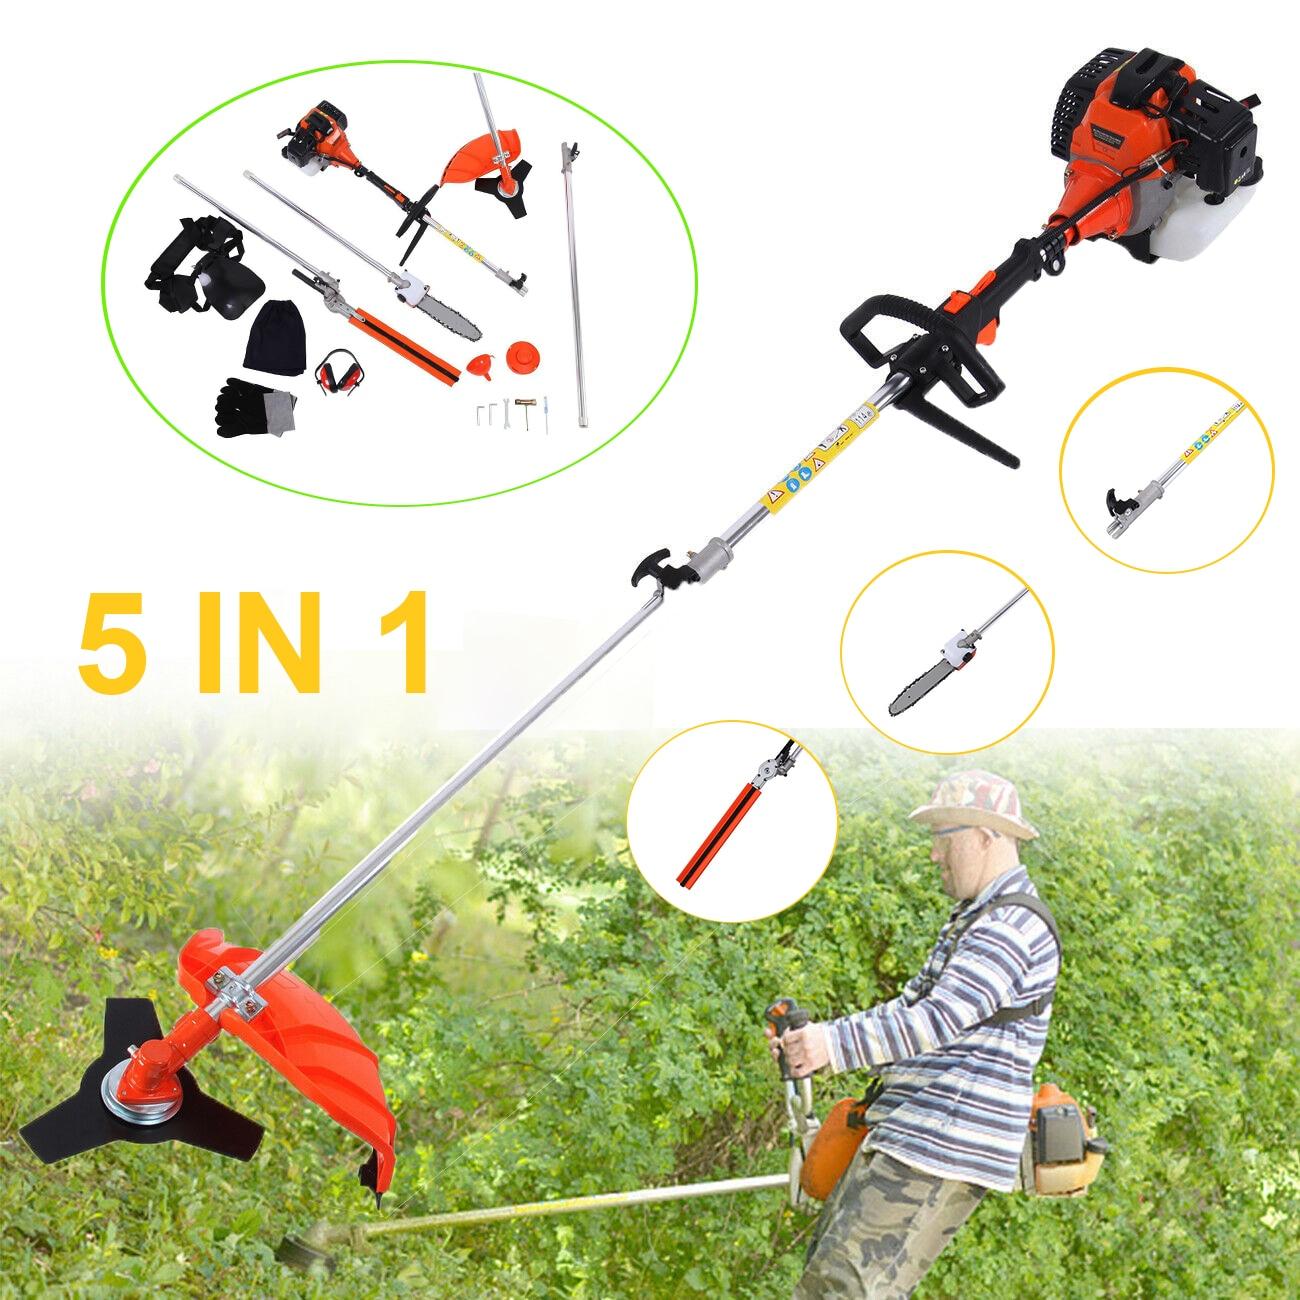 Honhill 5 in 1 52cc Petrol Chainsaw Hedge Trimmer Brush Cutter Grass Strimmer Pruner